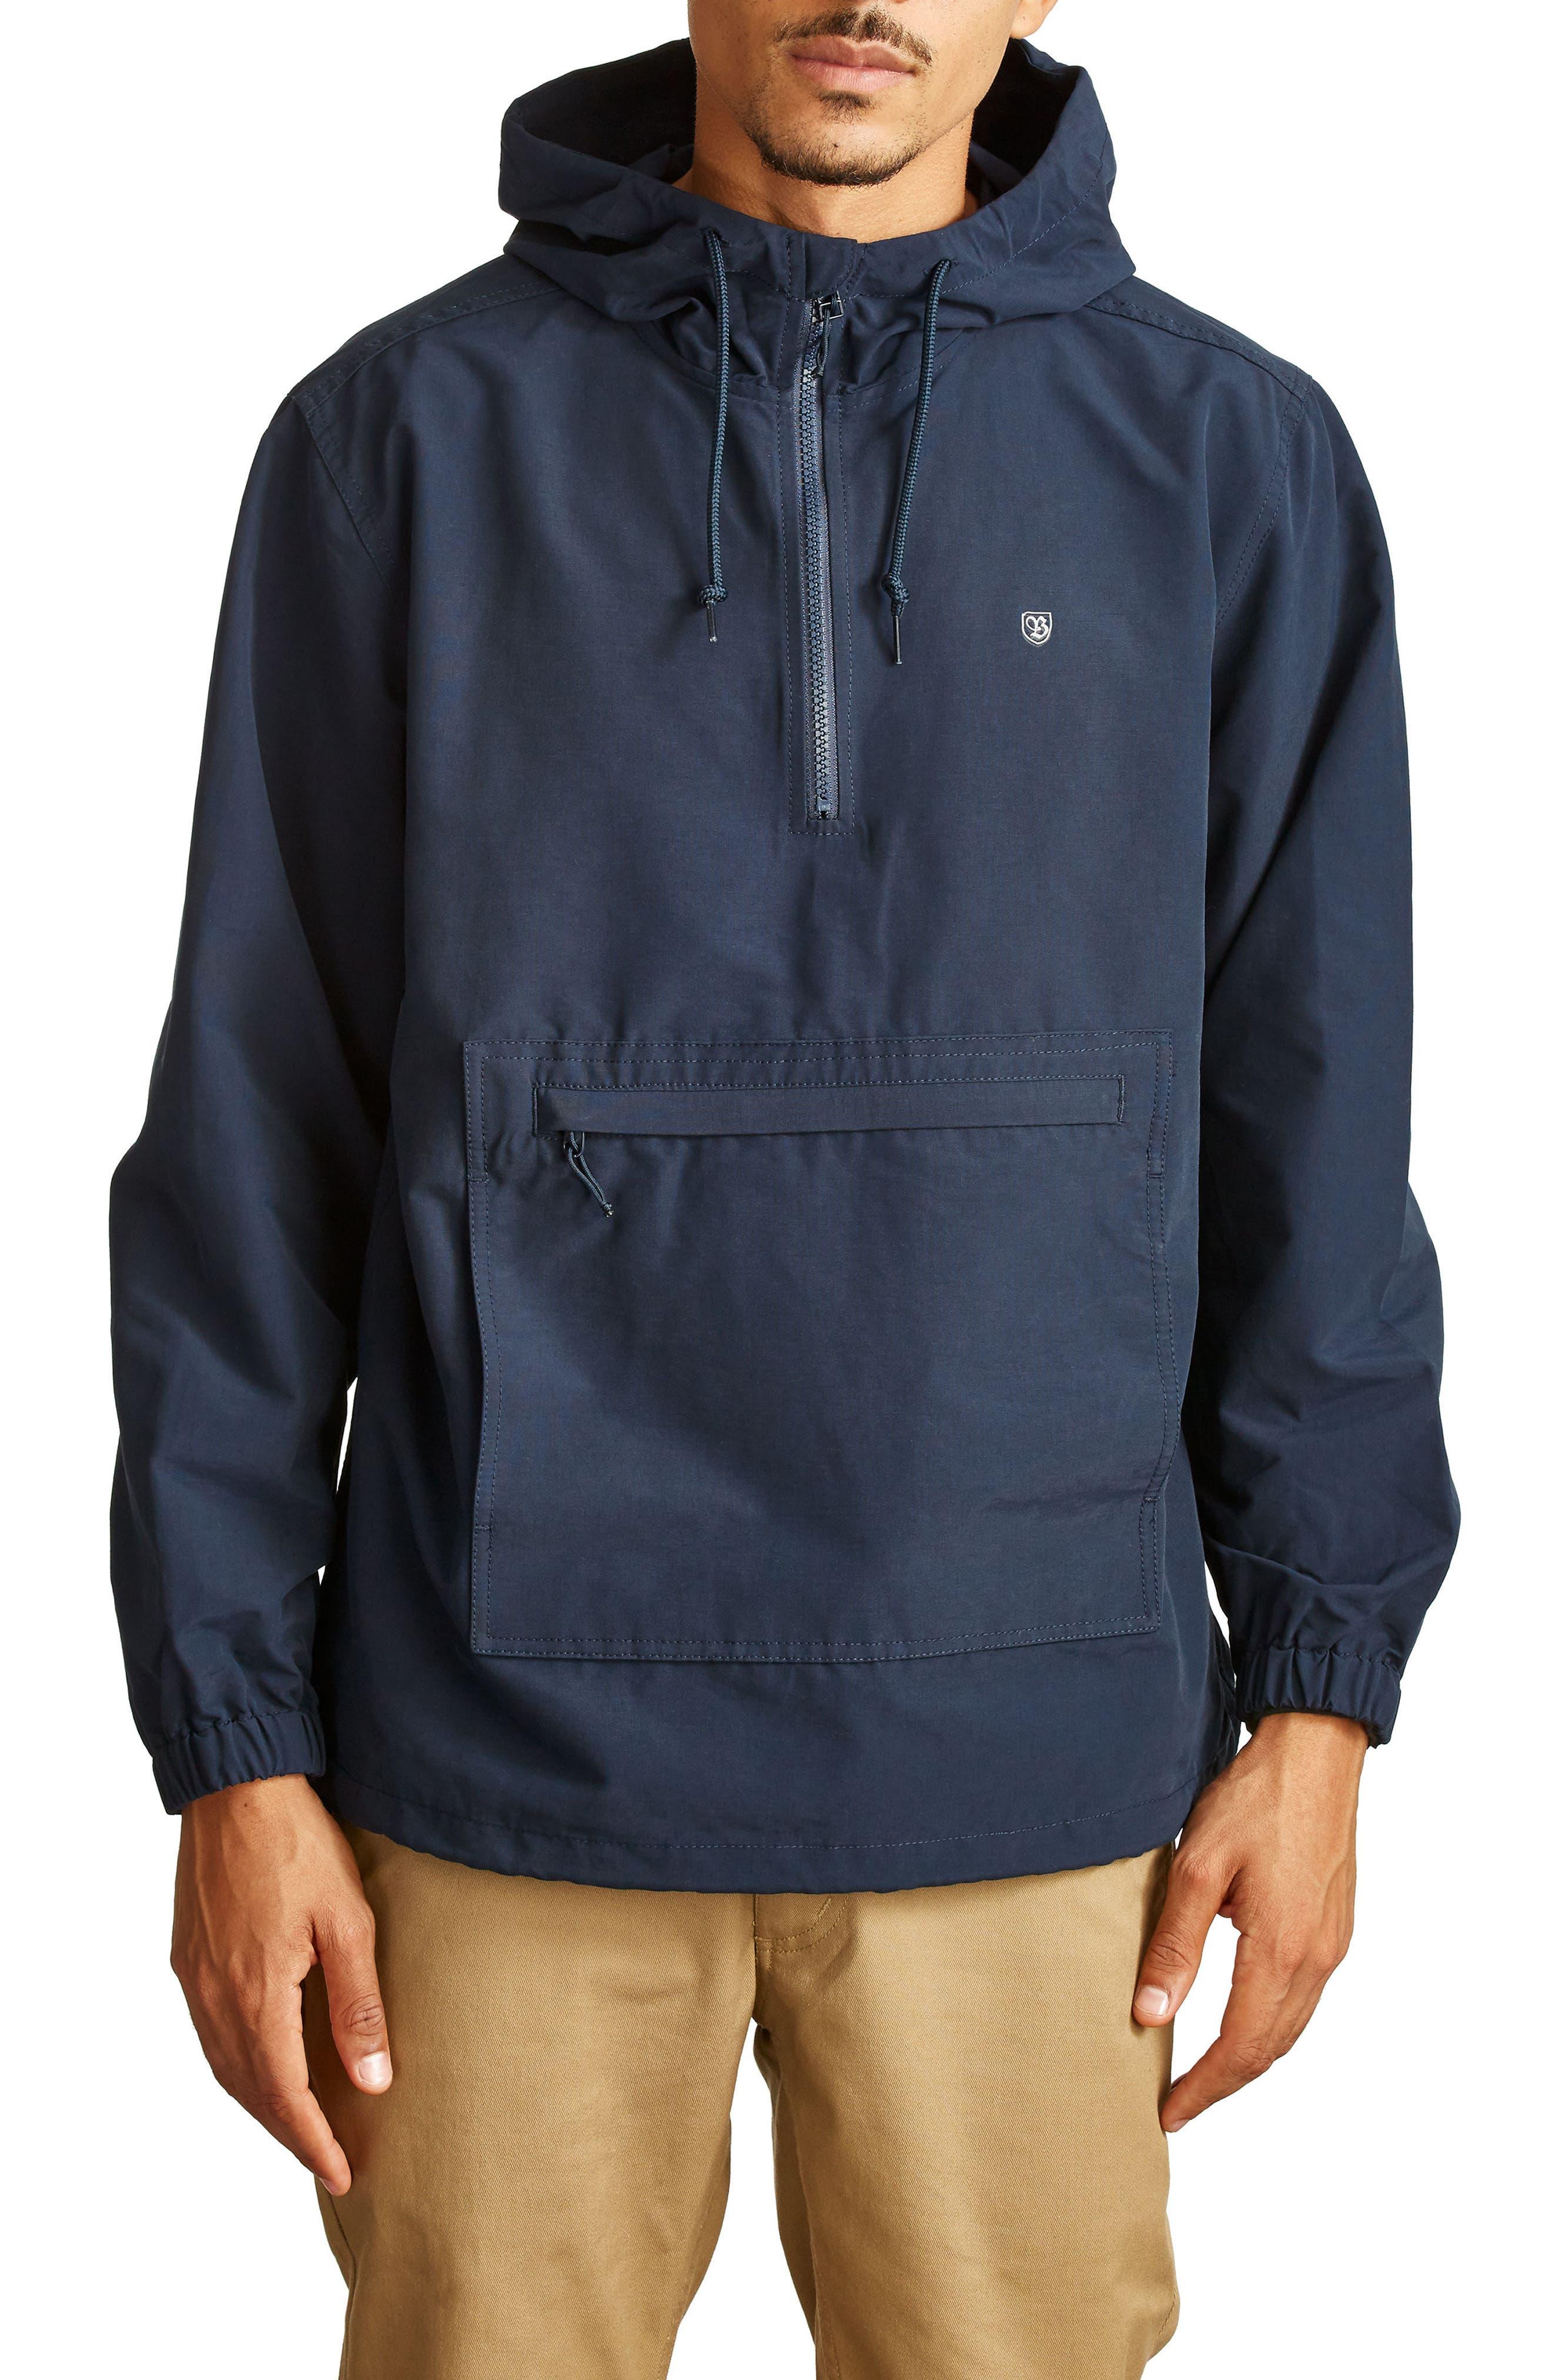 Brixton Patrol Water-Resistant Anorak Jacket